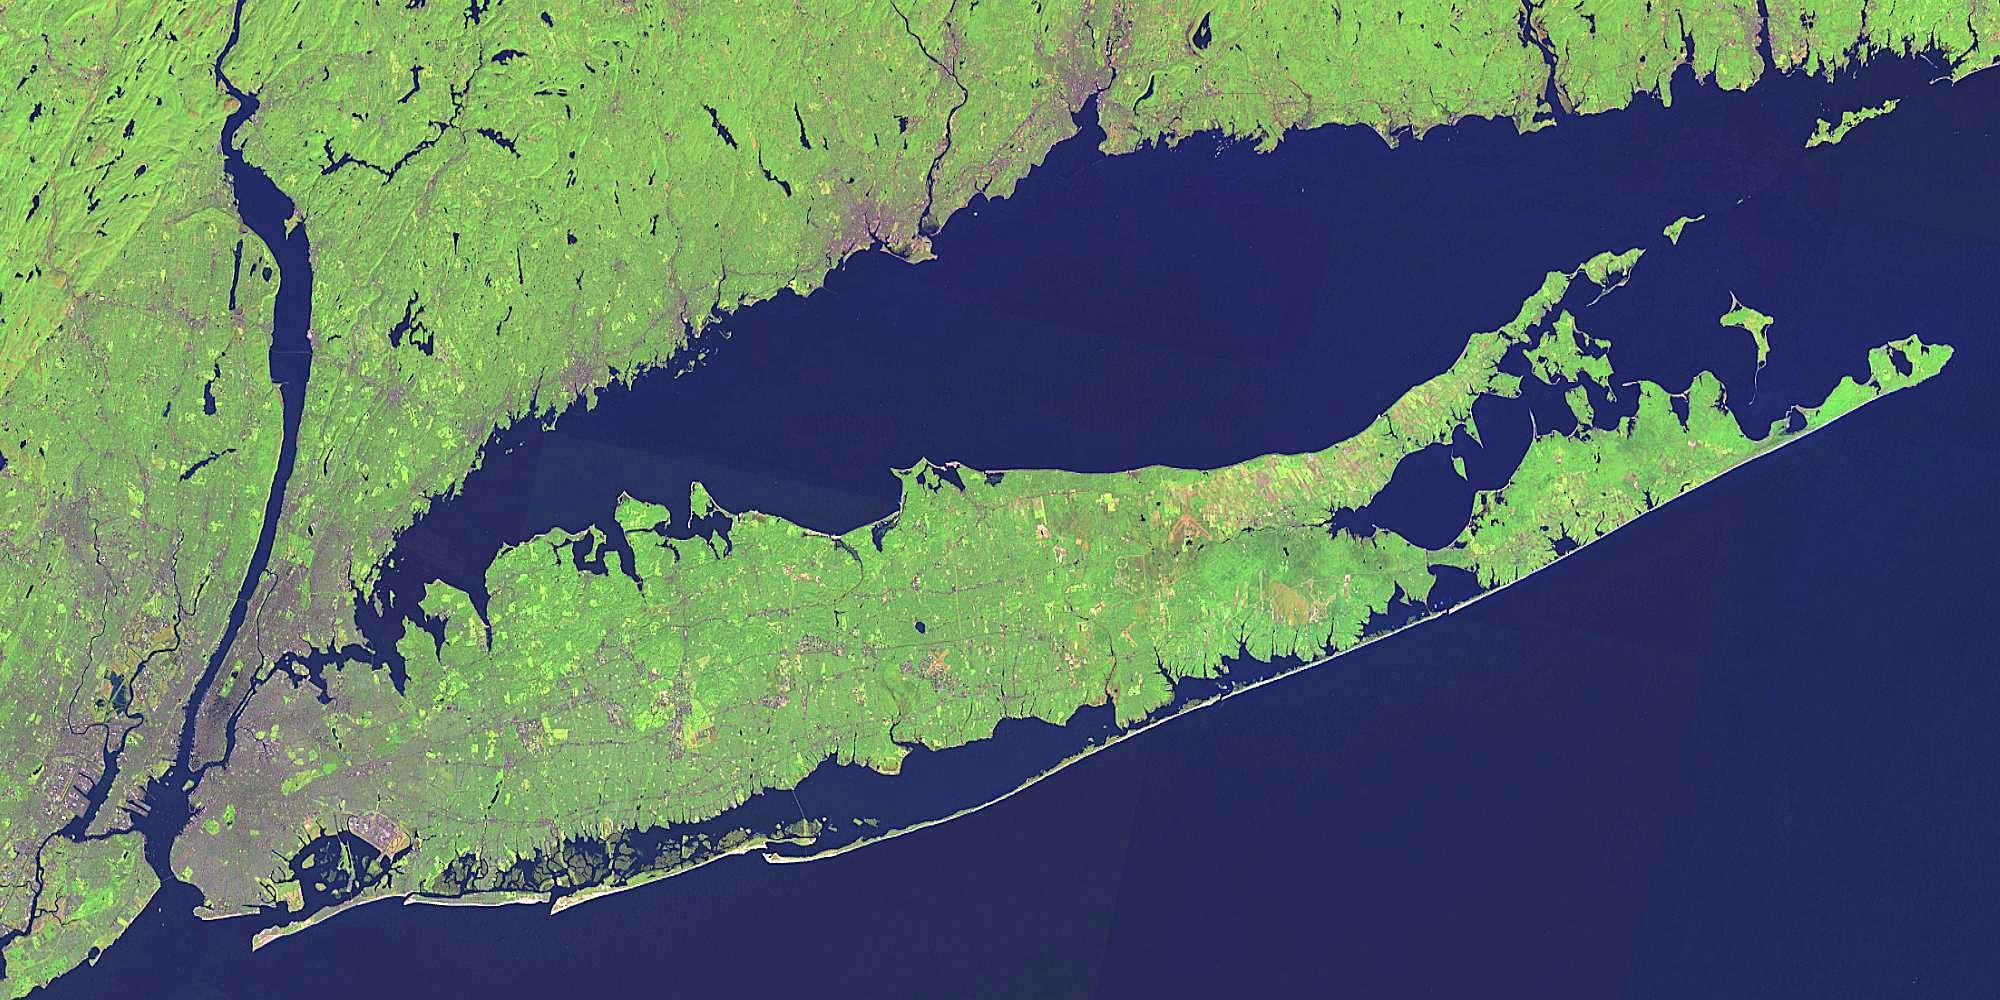 http://upload.http://upload.wikimedia.org/wikipedia/commons/c/c0/Long_Island_Landsat_Mosaic.jpgwikimedia.org/wikipedia/commons/c/c0/Long_Island_Landsat_Mosaic.jpg